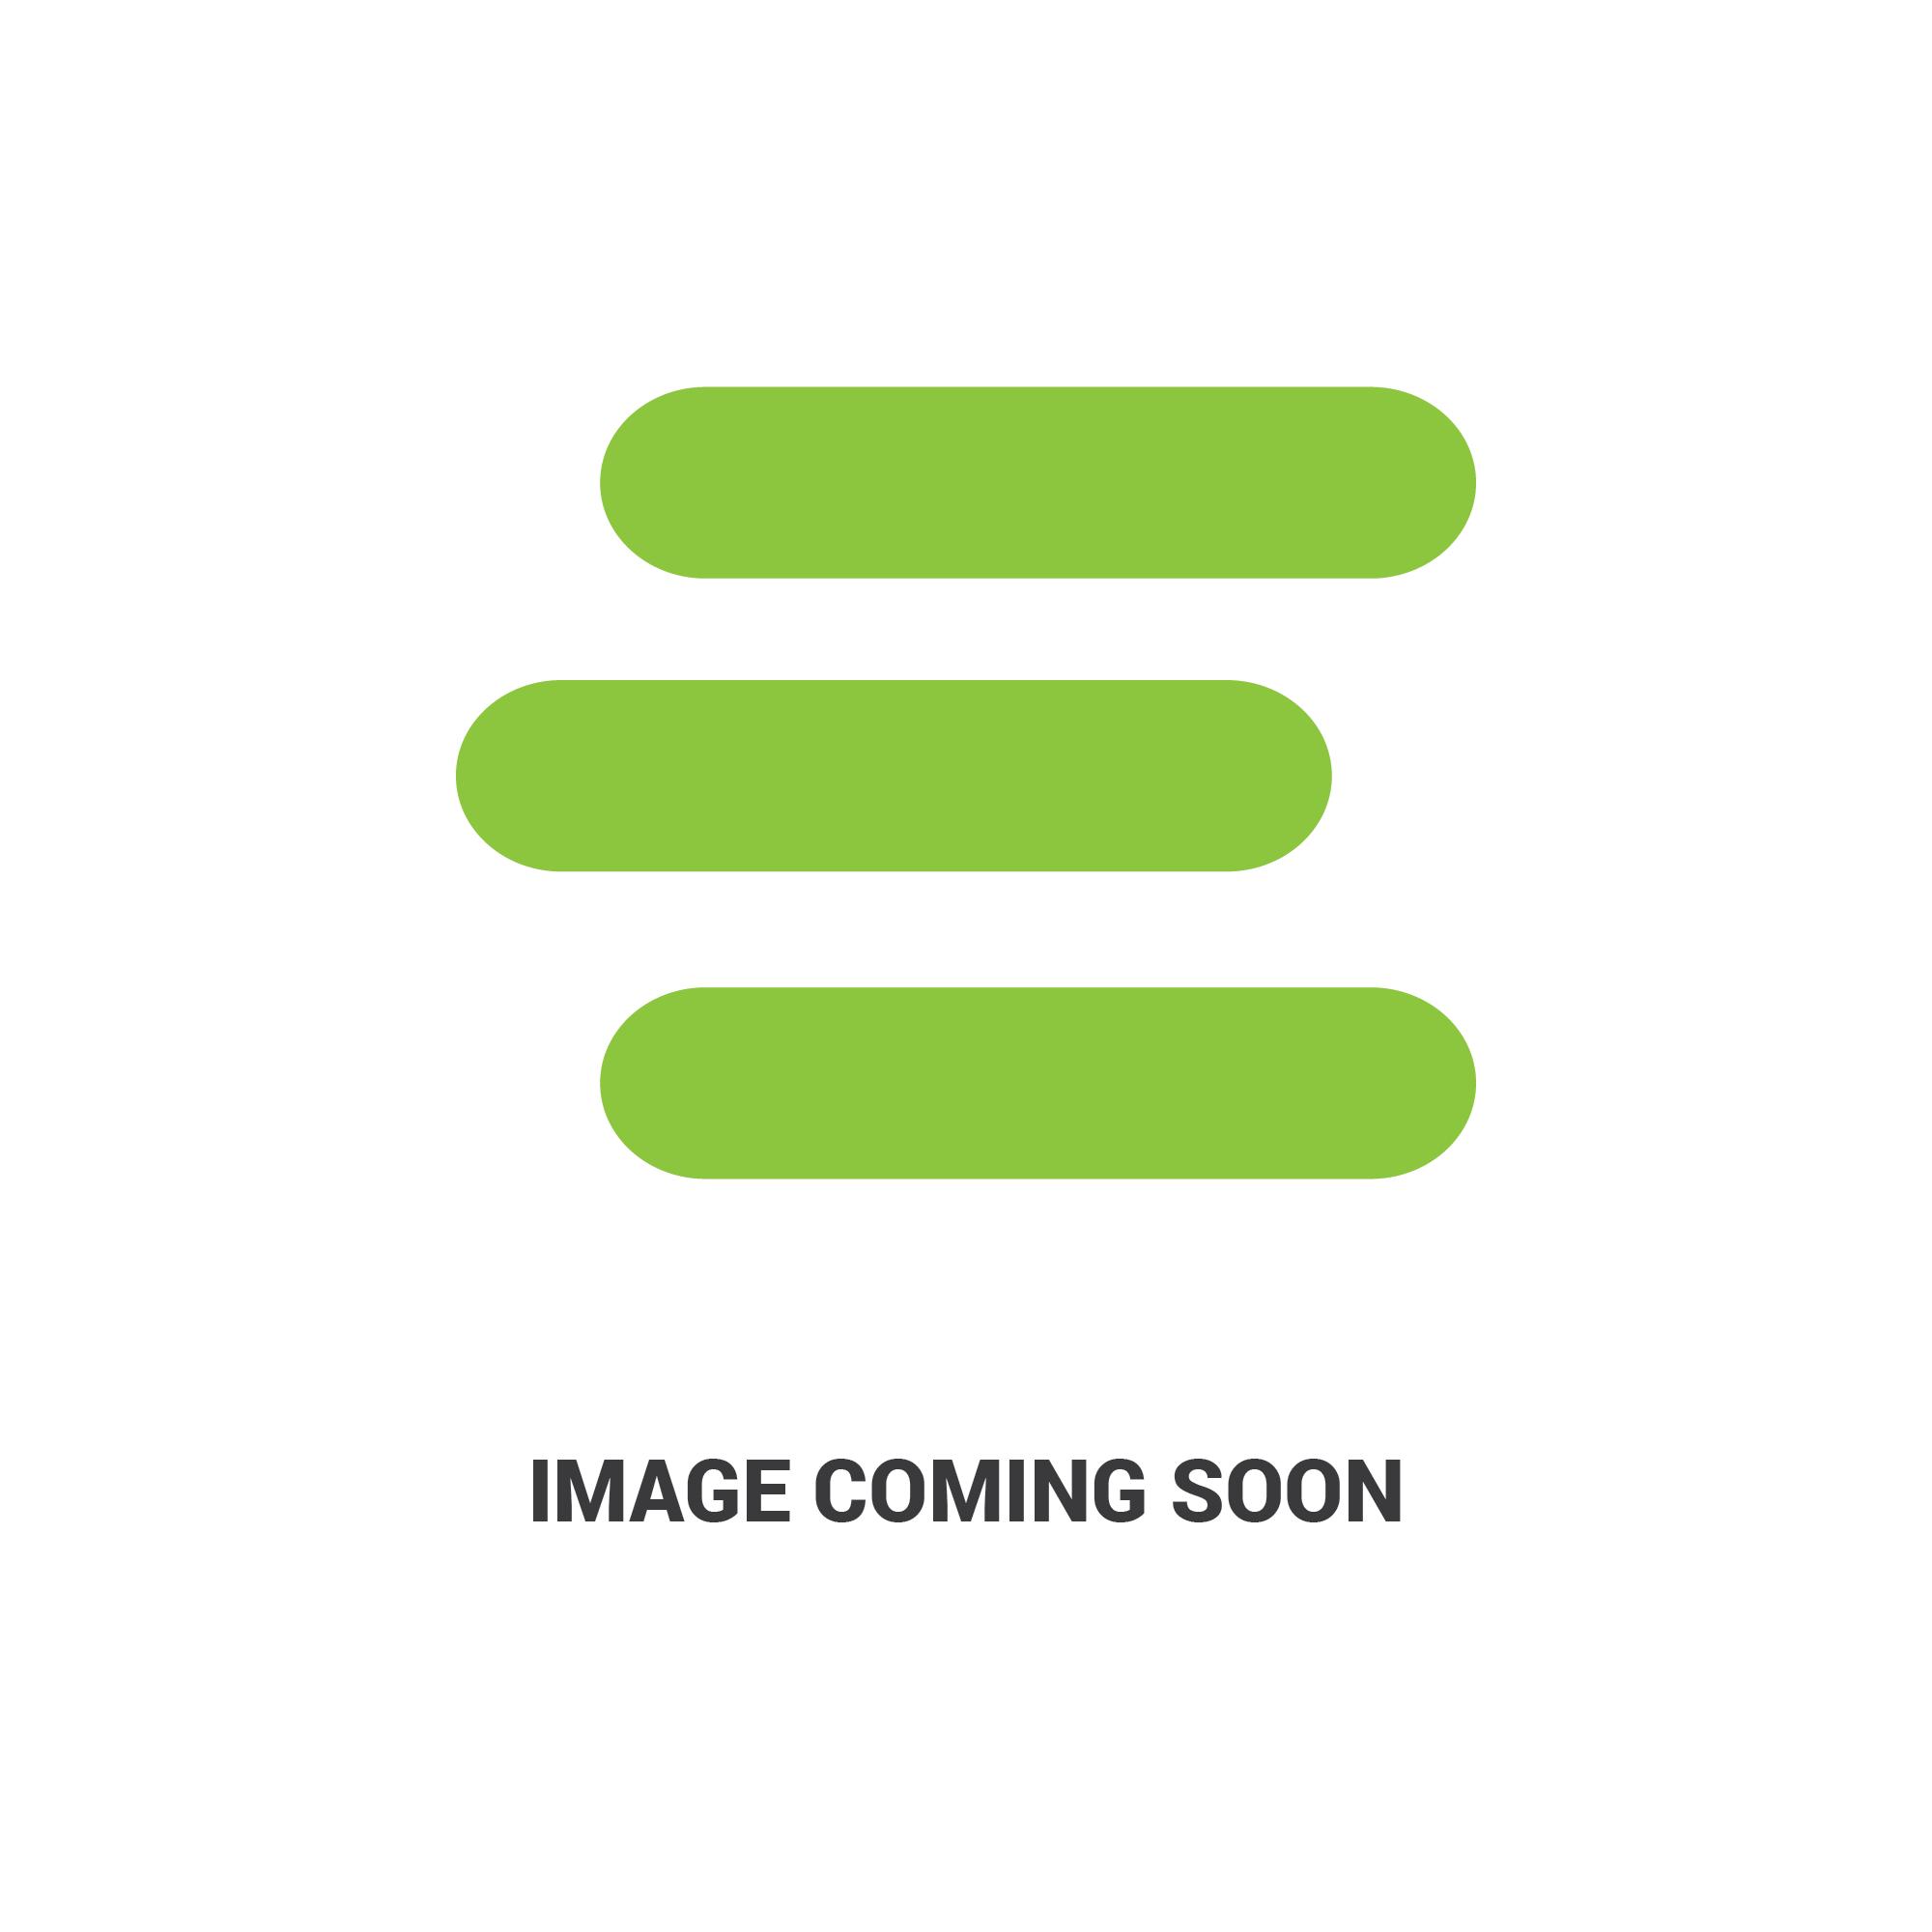 E-15241-32092edit 228.jpg